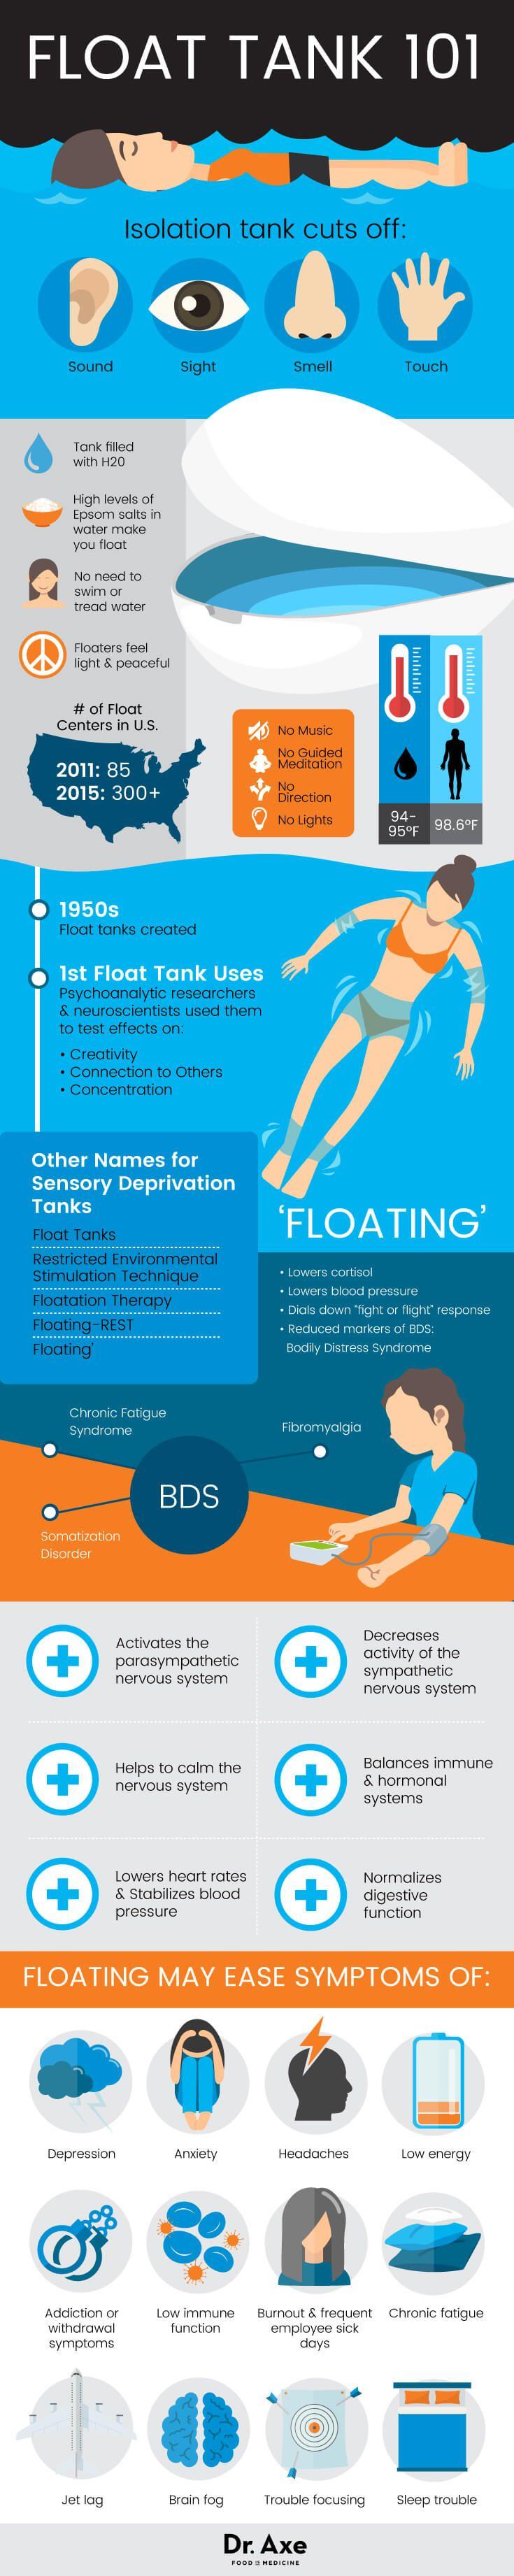 Sensory deprivation tank - Dr. Axe http://www.draxe.com #health #holistic #natural